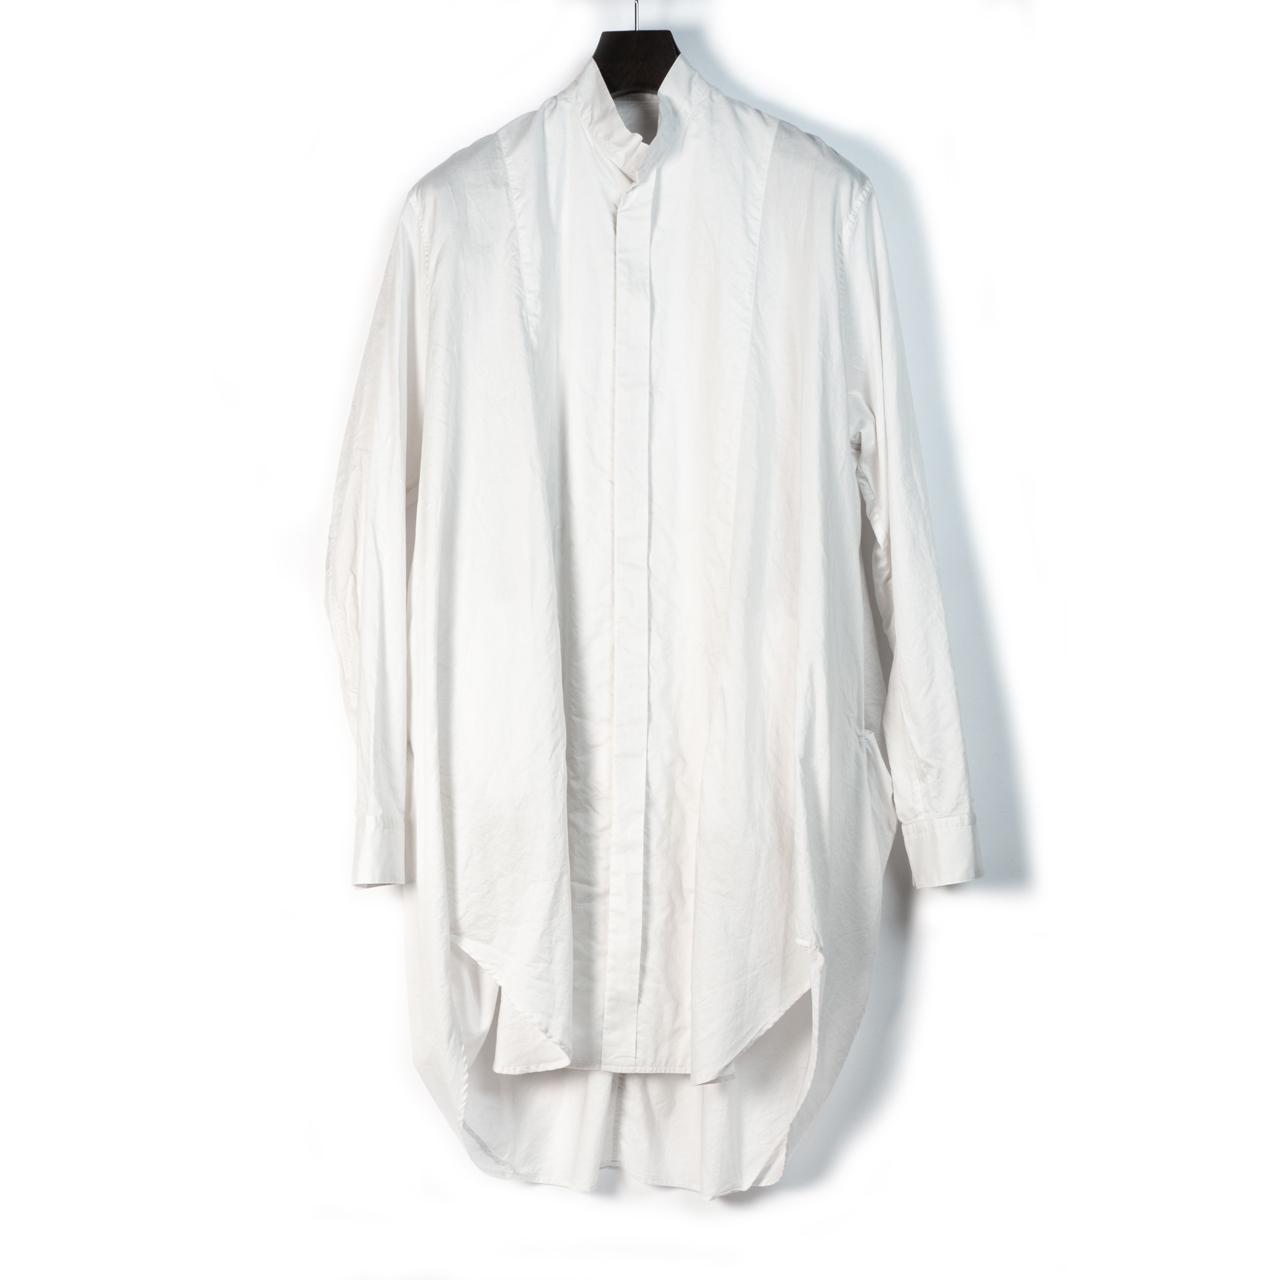 697SHM2-WHITE / スタンドカラーロングシャツ